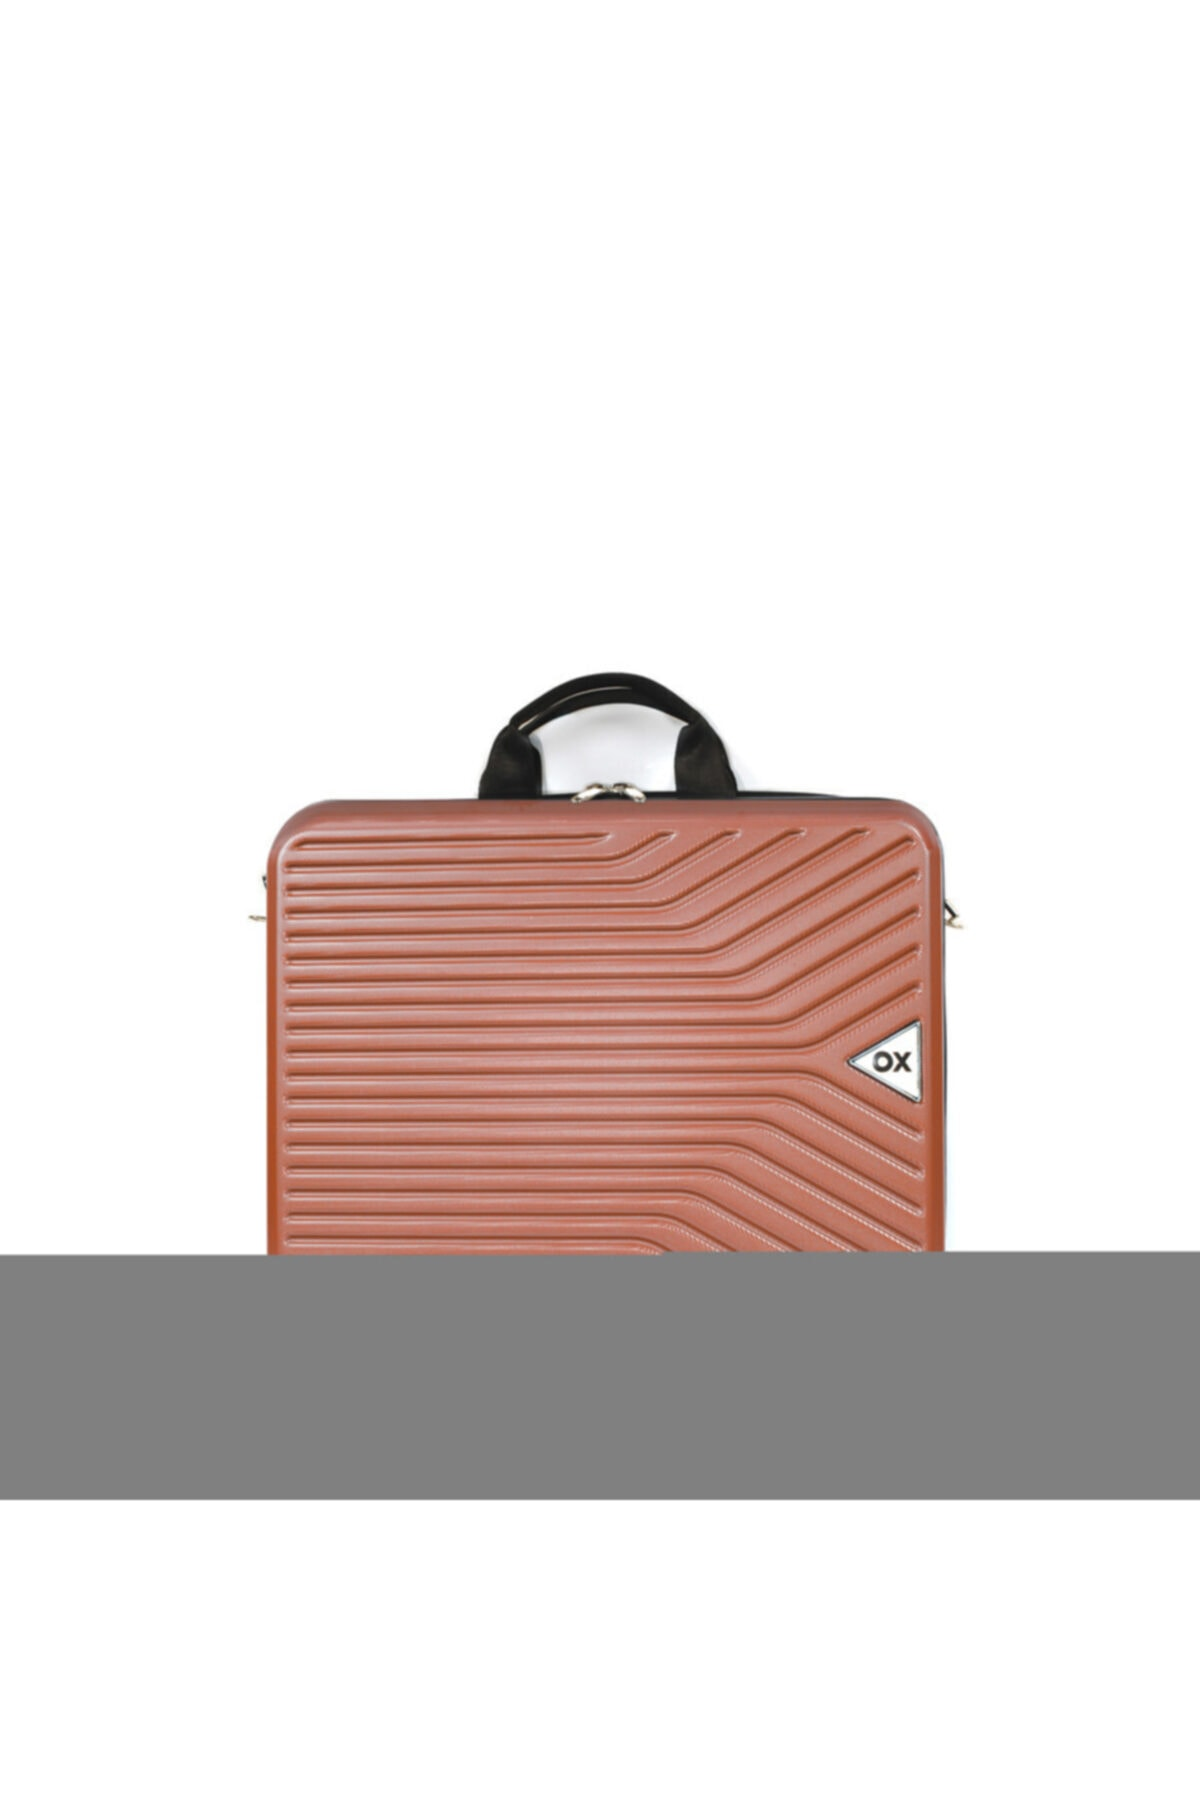 OX 17.3 Inç Rose Gold Notebook - Laptop Çantası 2